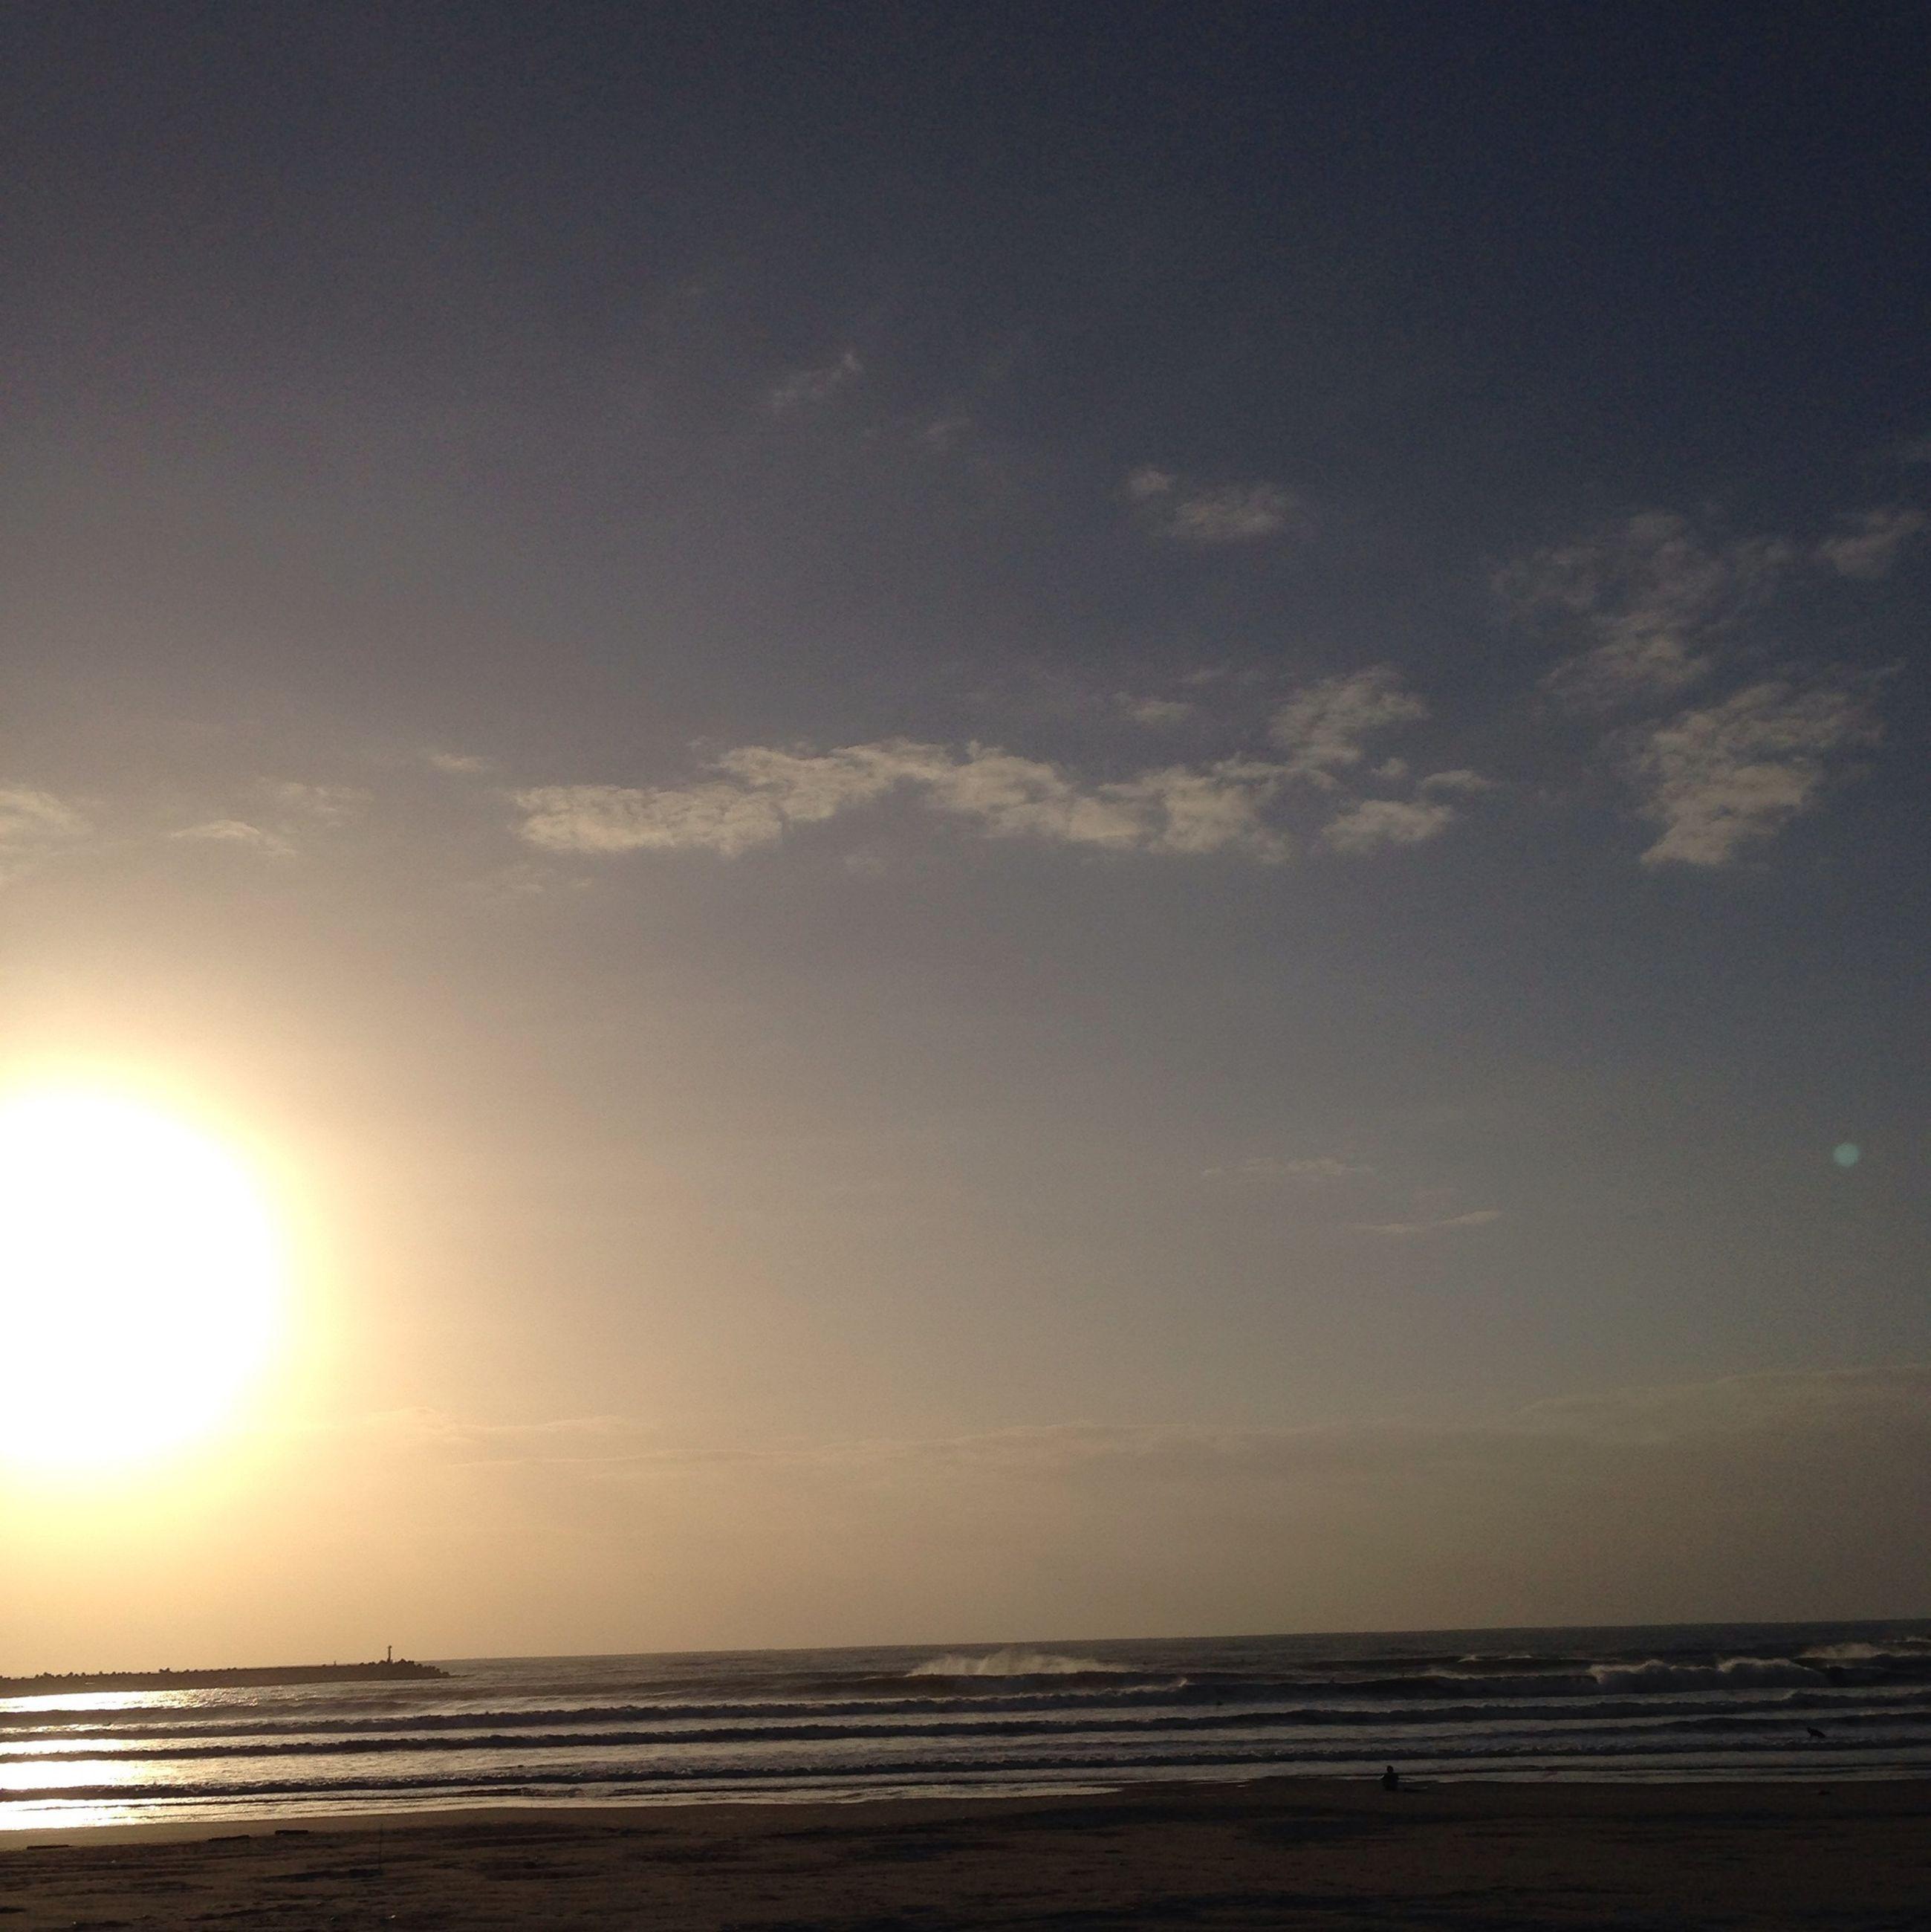 sea, horizon over water, water, beach, scenics, tranquil scene, tranquility, beauty in nature, sunset, sky, sun, shore, nature, idyllic, sand, sunlight, seascape, outdoors, remote, sunbeam